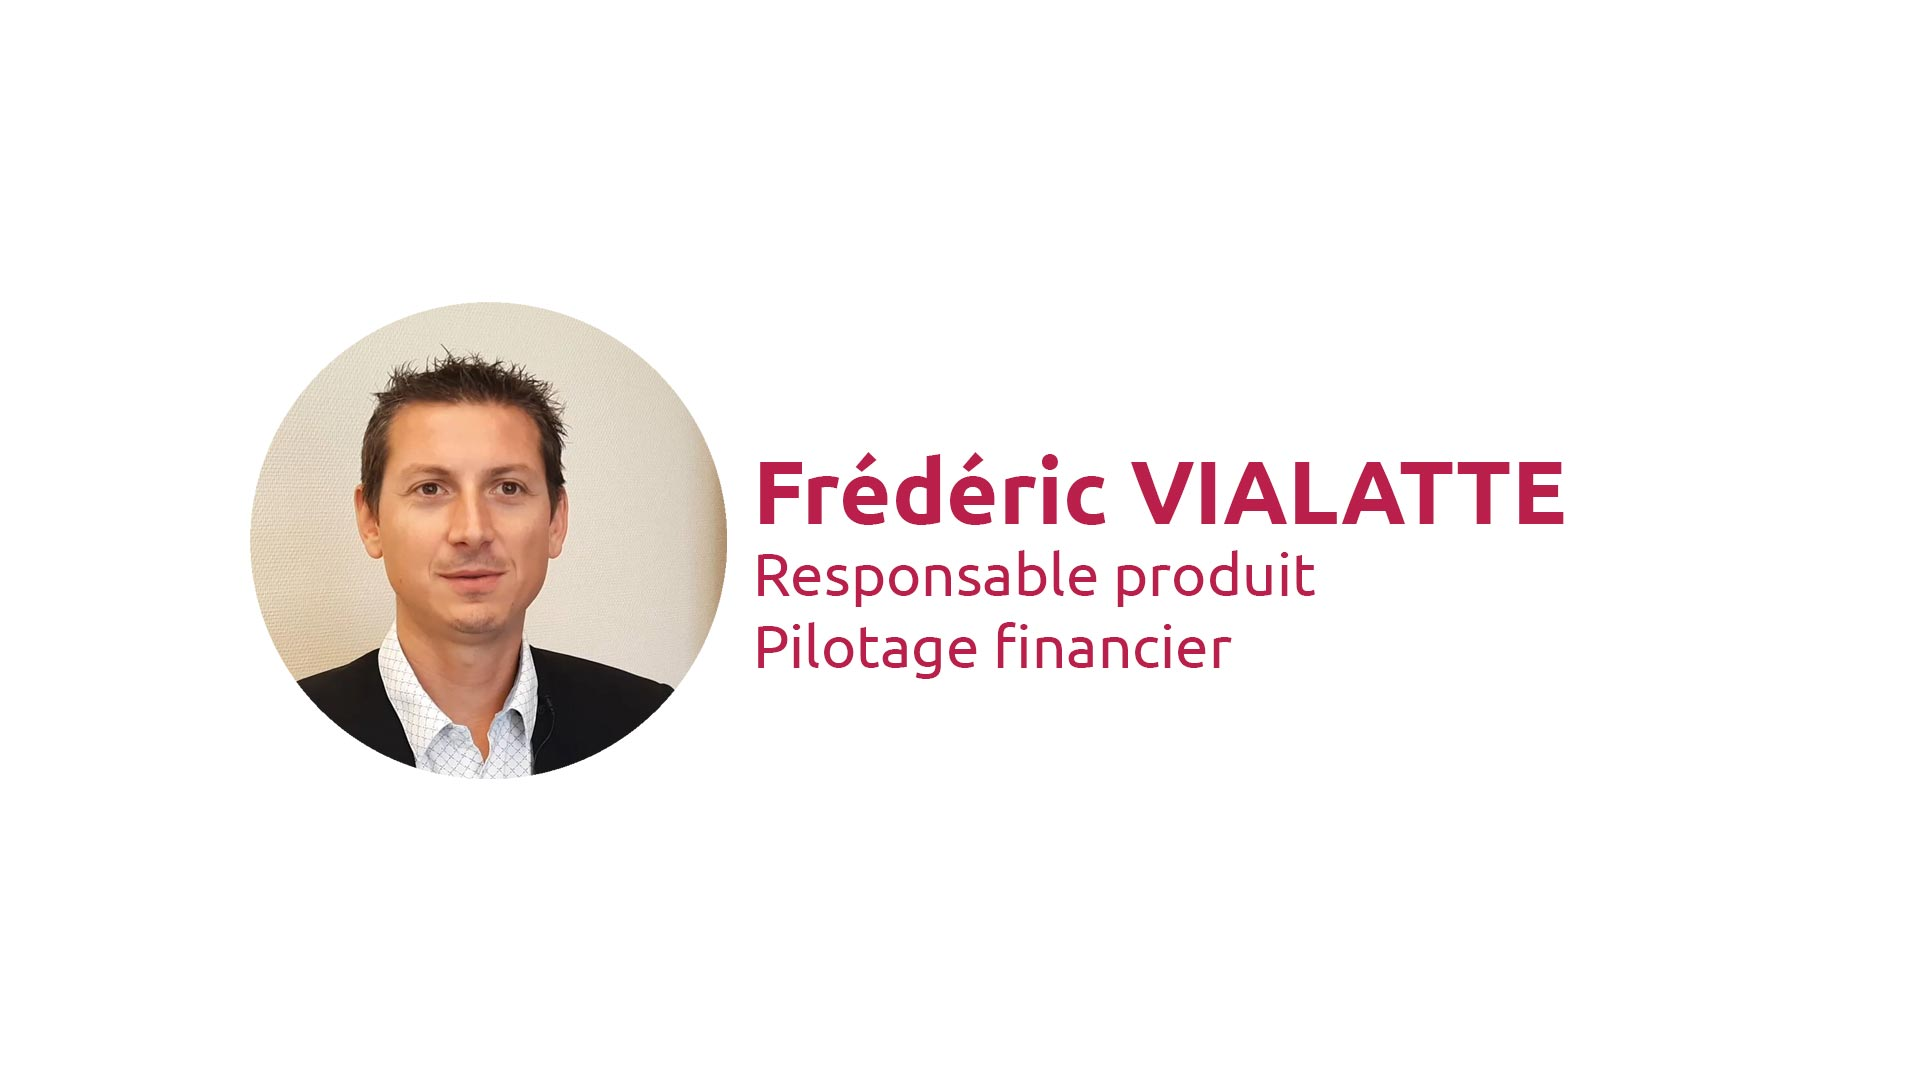 Frederic-Vialatte